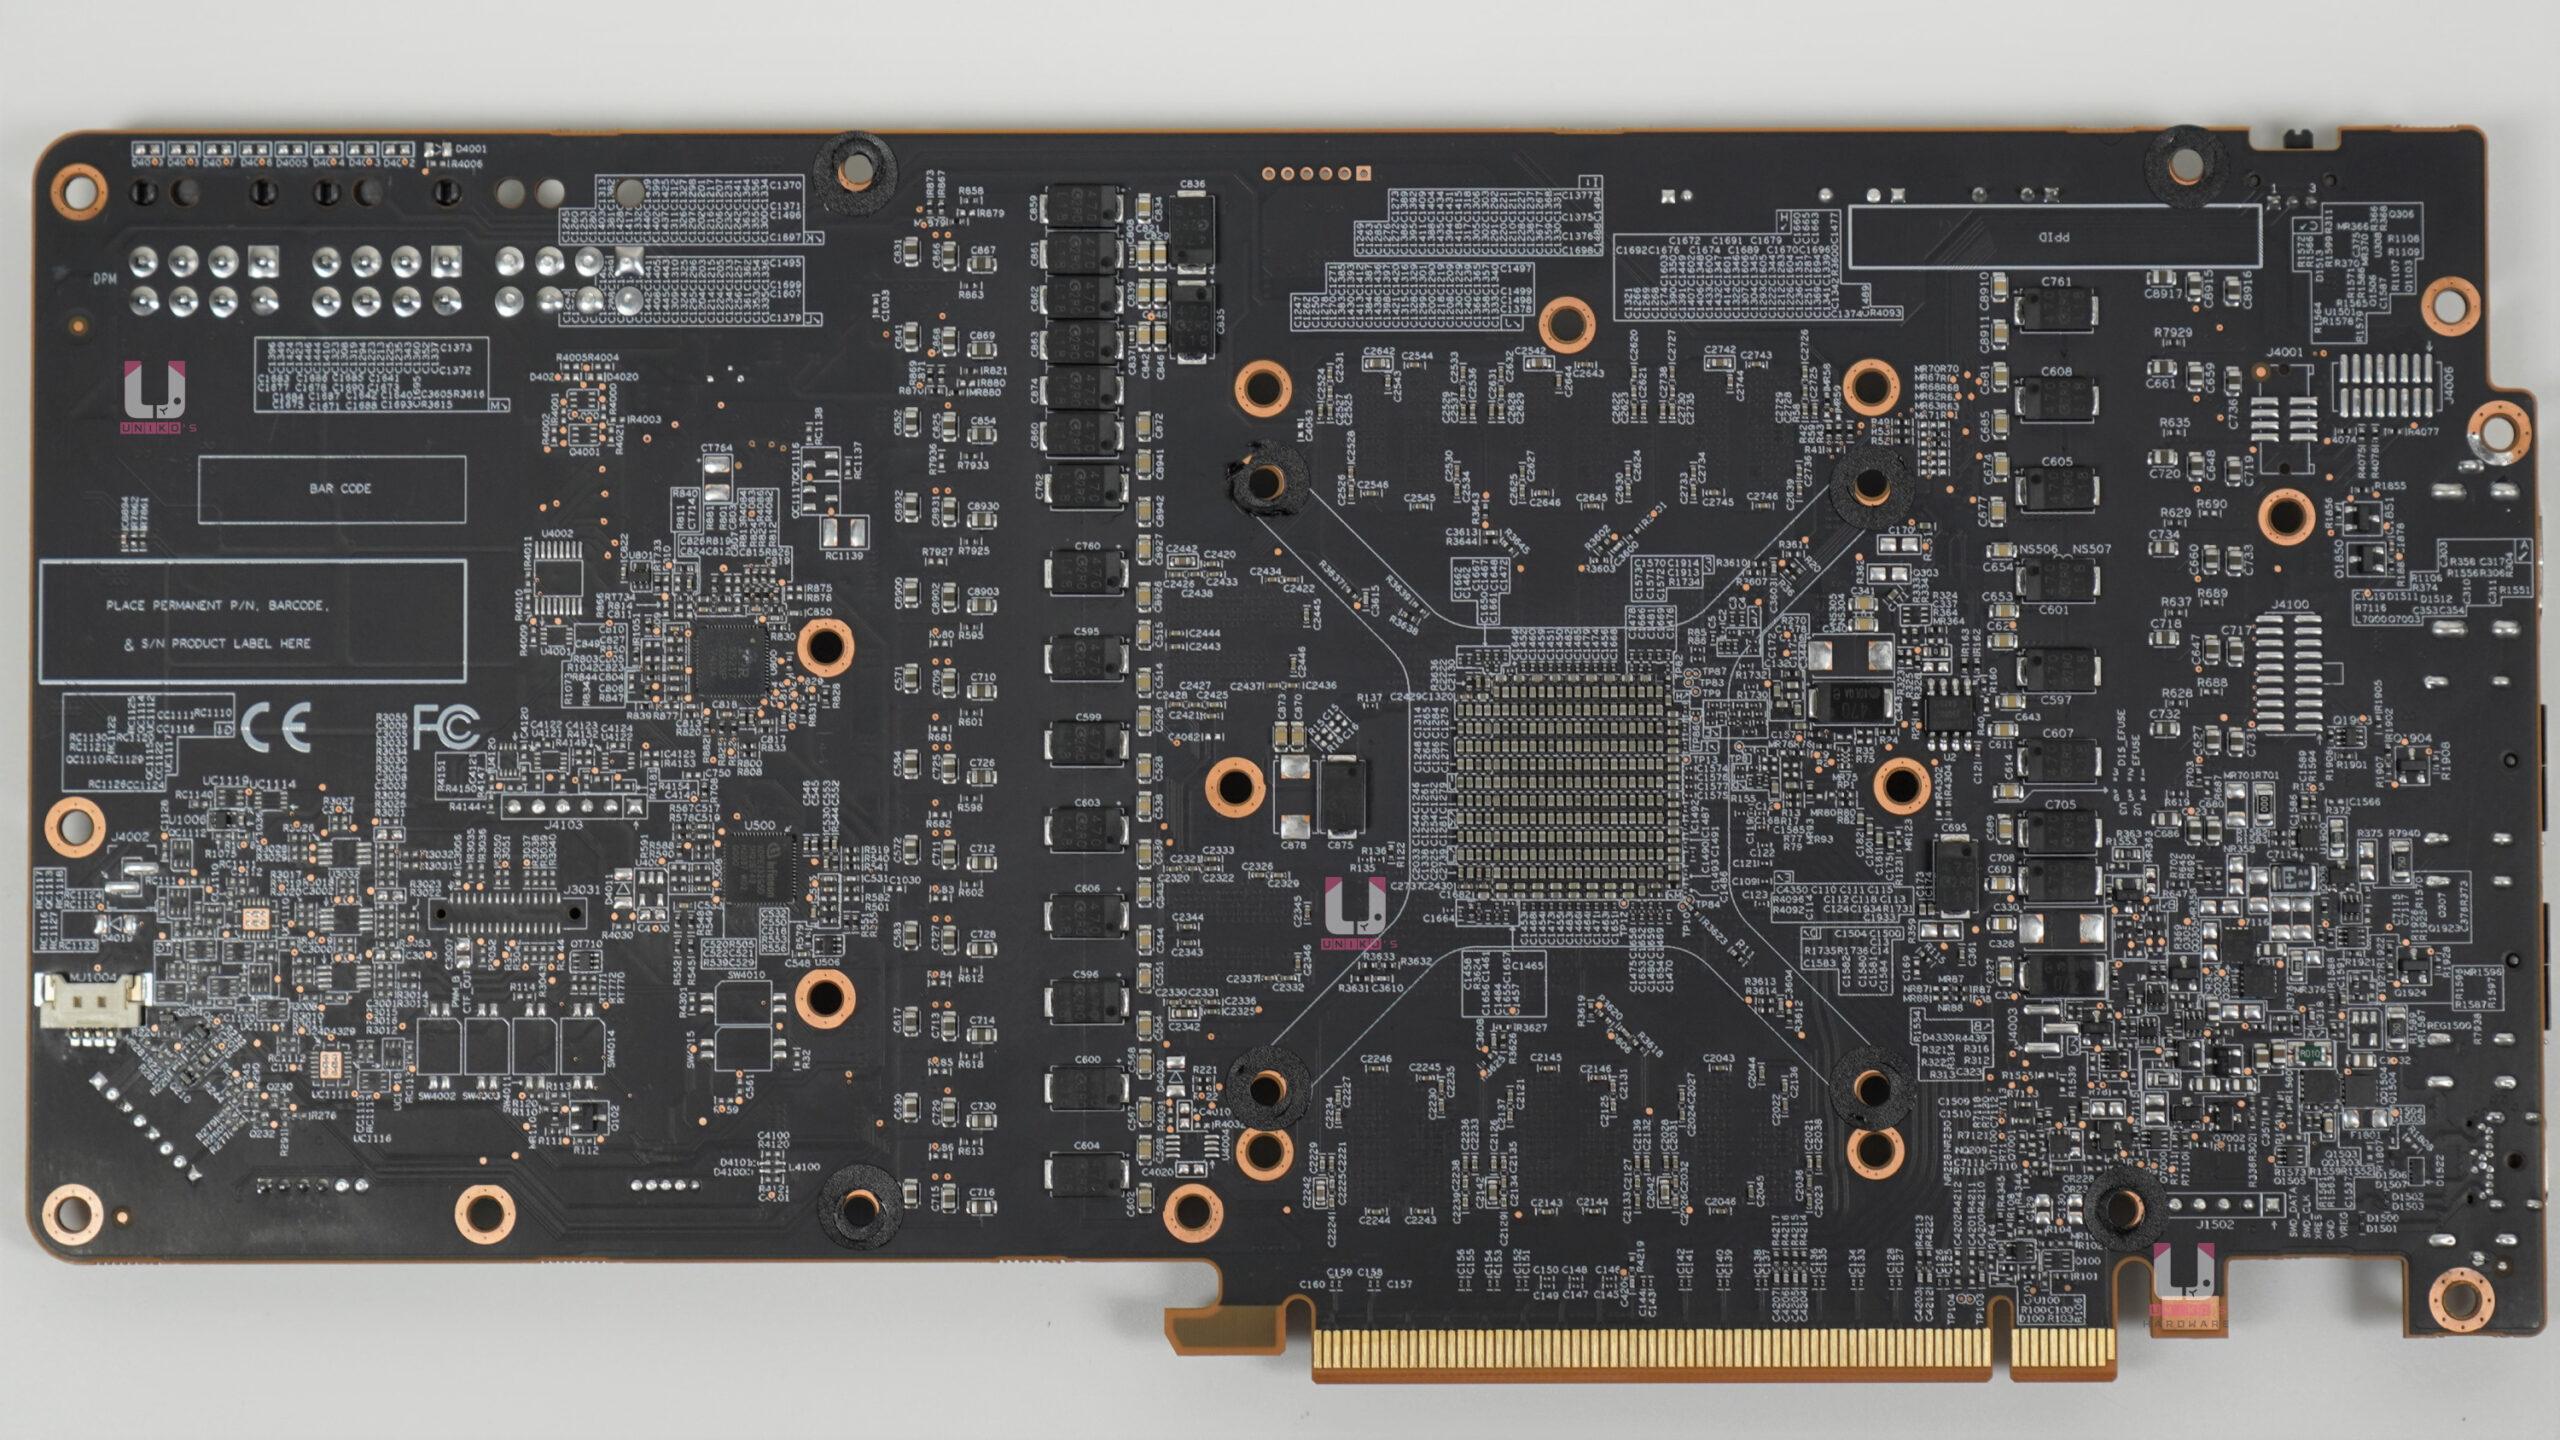 Radeon RX 6800 XT Red Devil PCB 電路板背面。